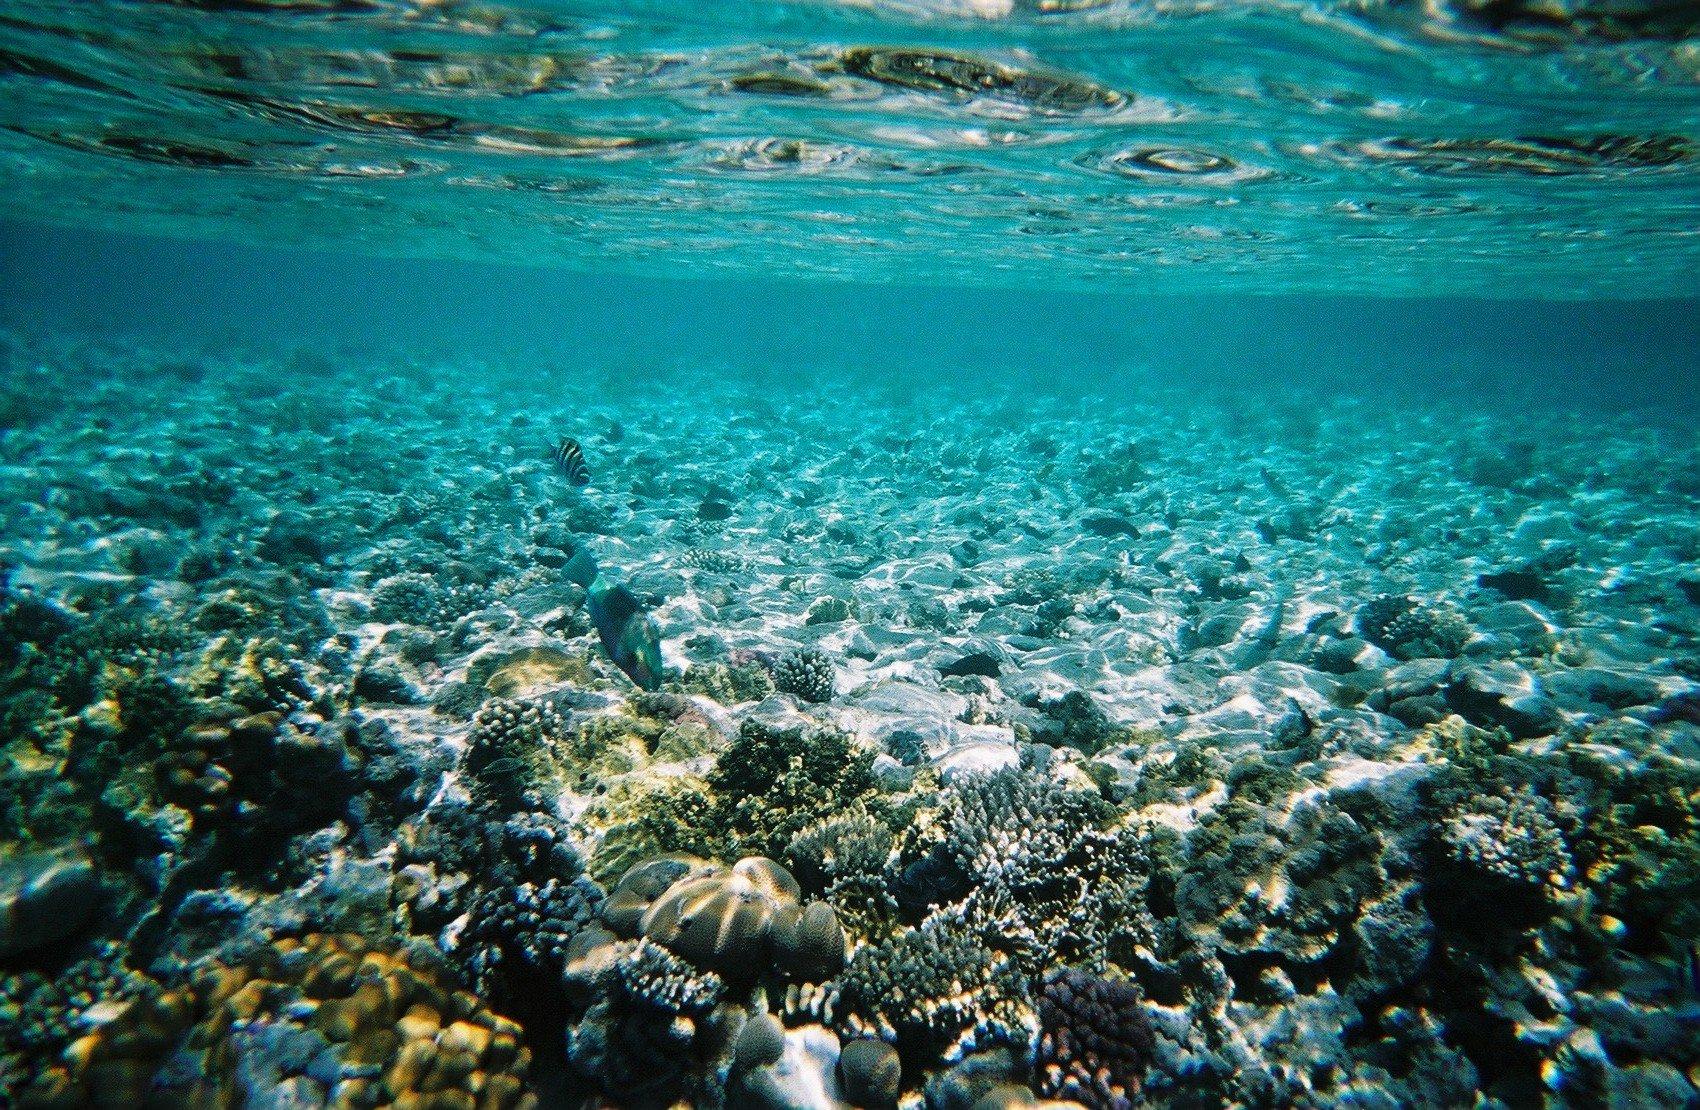 Heaven Under The Sea By Cassie O On Deviantart